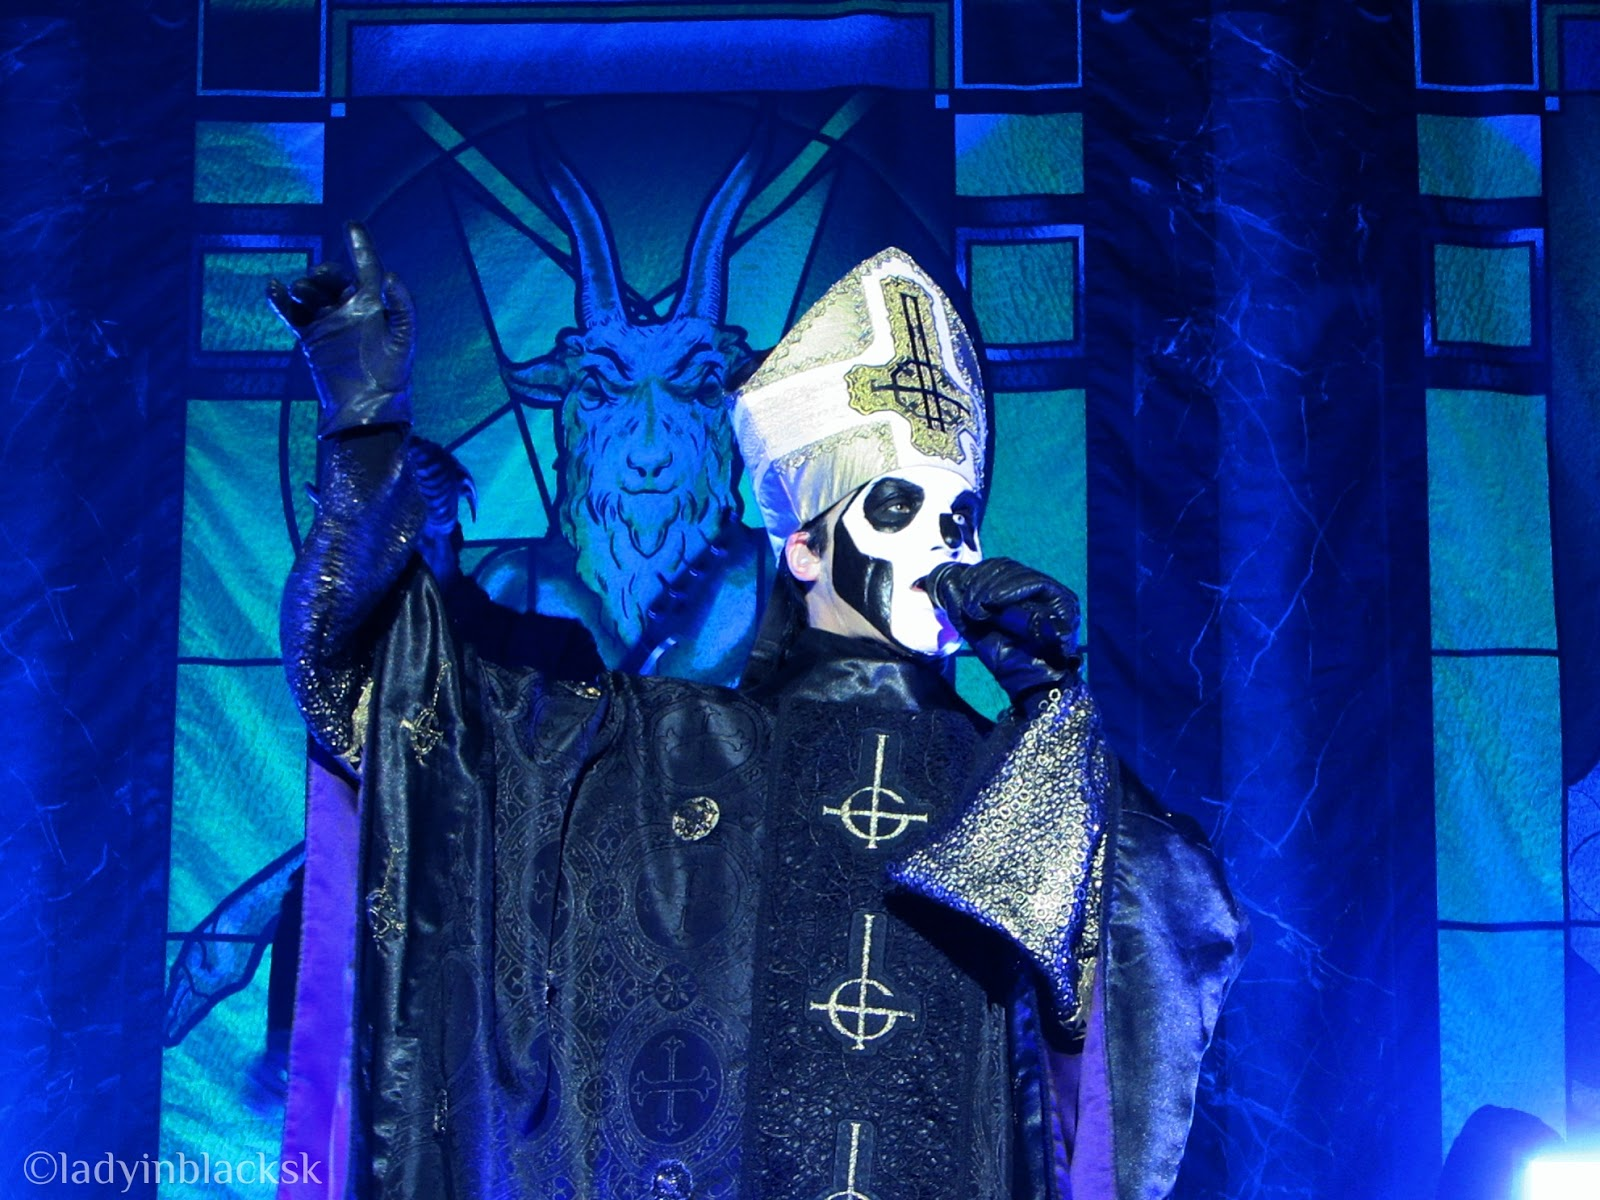 ghost papa emeritus popestar nameless ghouls live